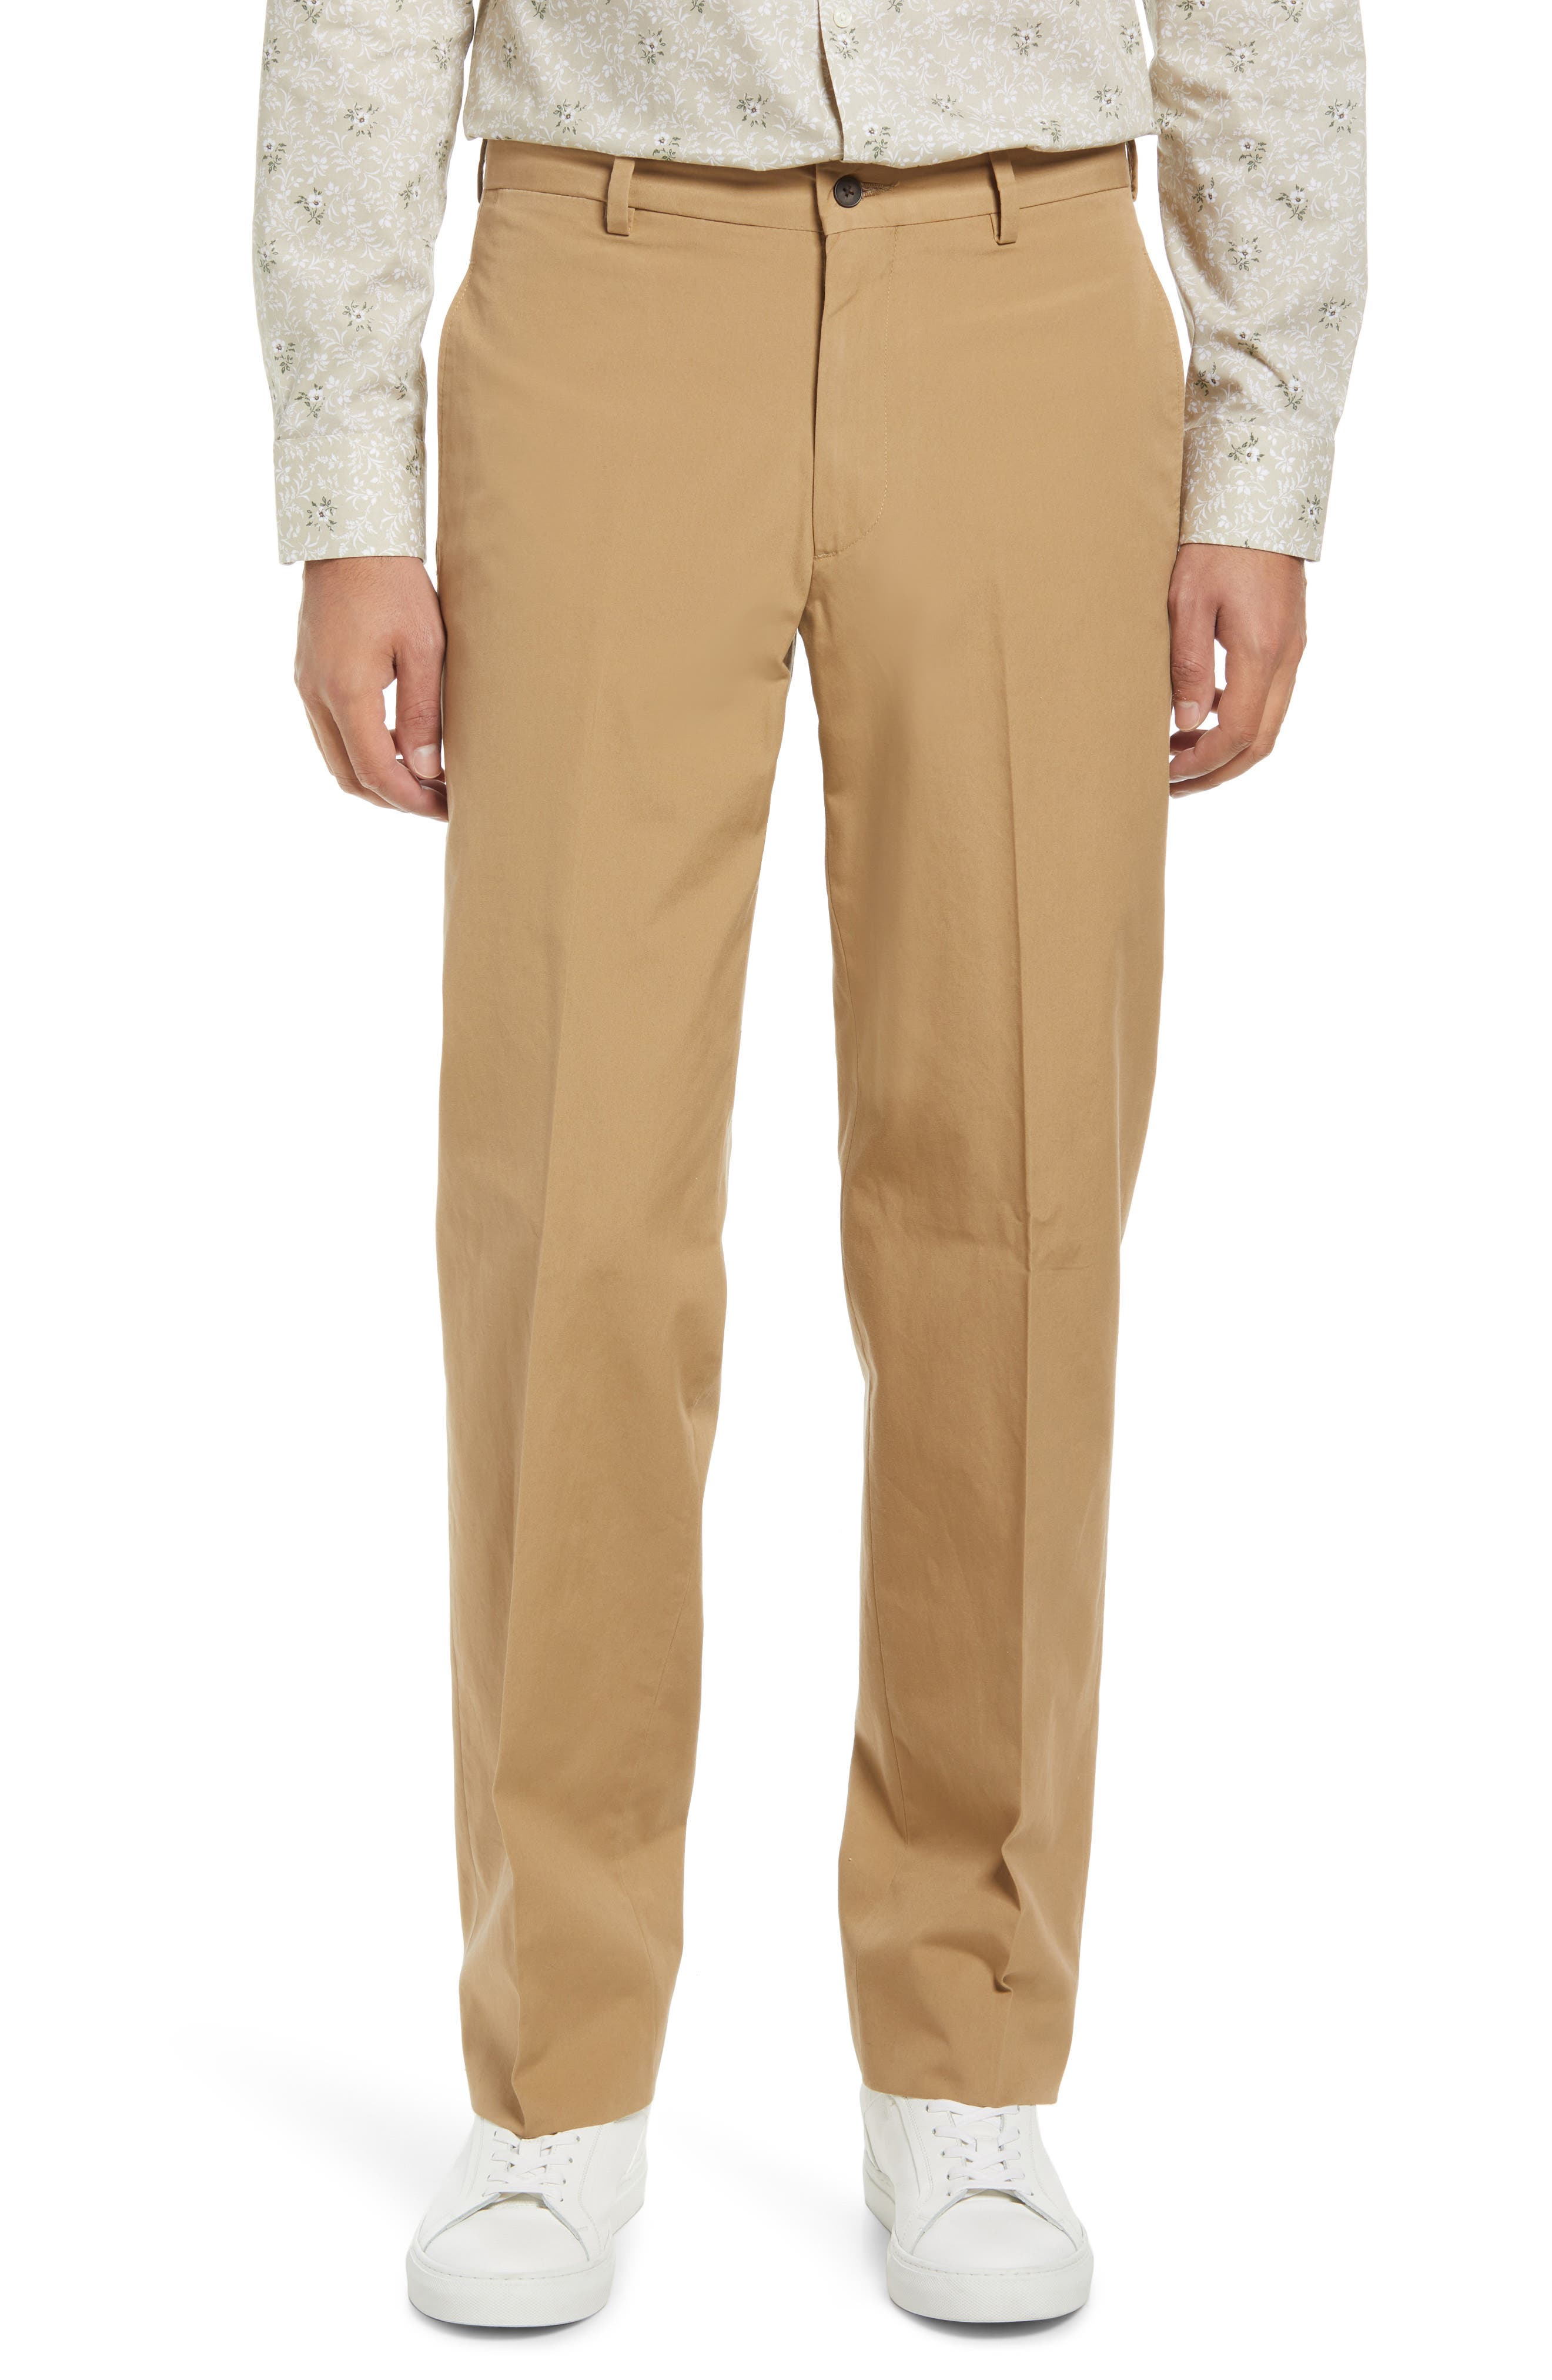 Men's Flat Front Cotton Poplin Dress Pants